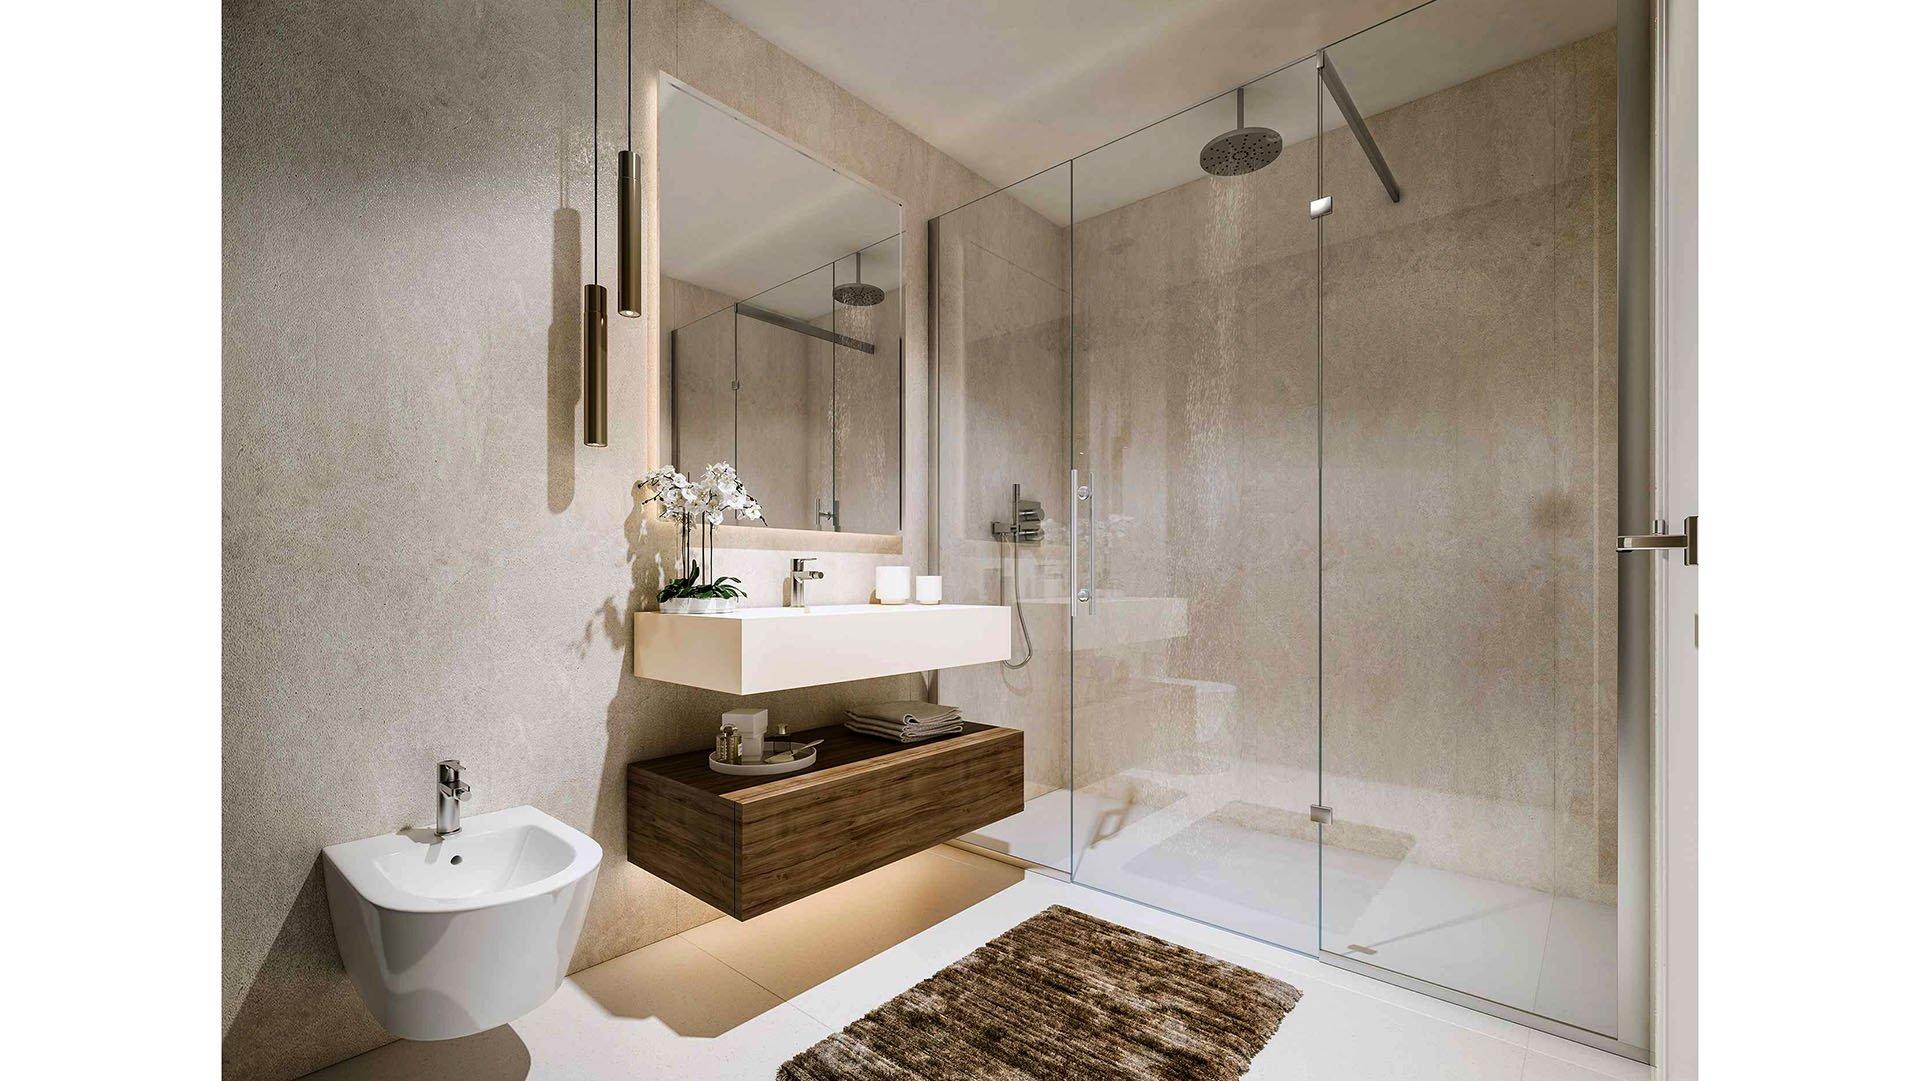 La Finca de Jasmine: Moderne luxe villa in Benahavís